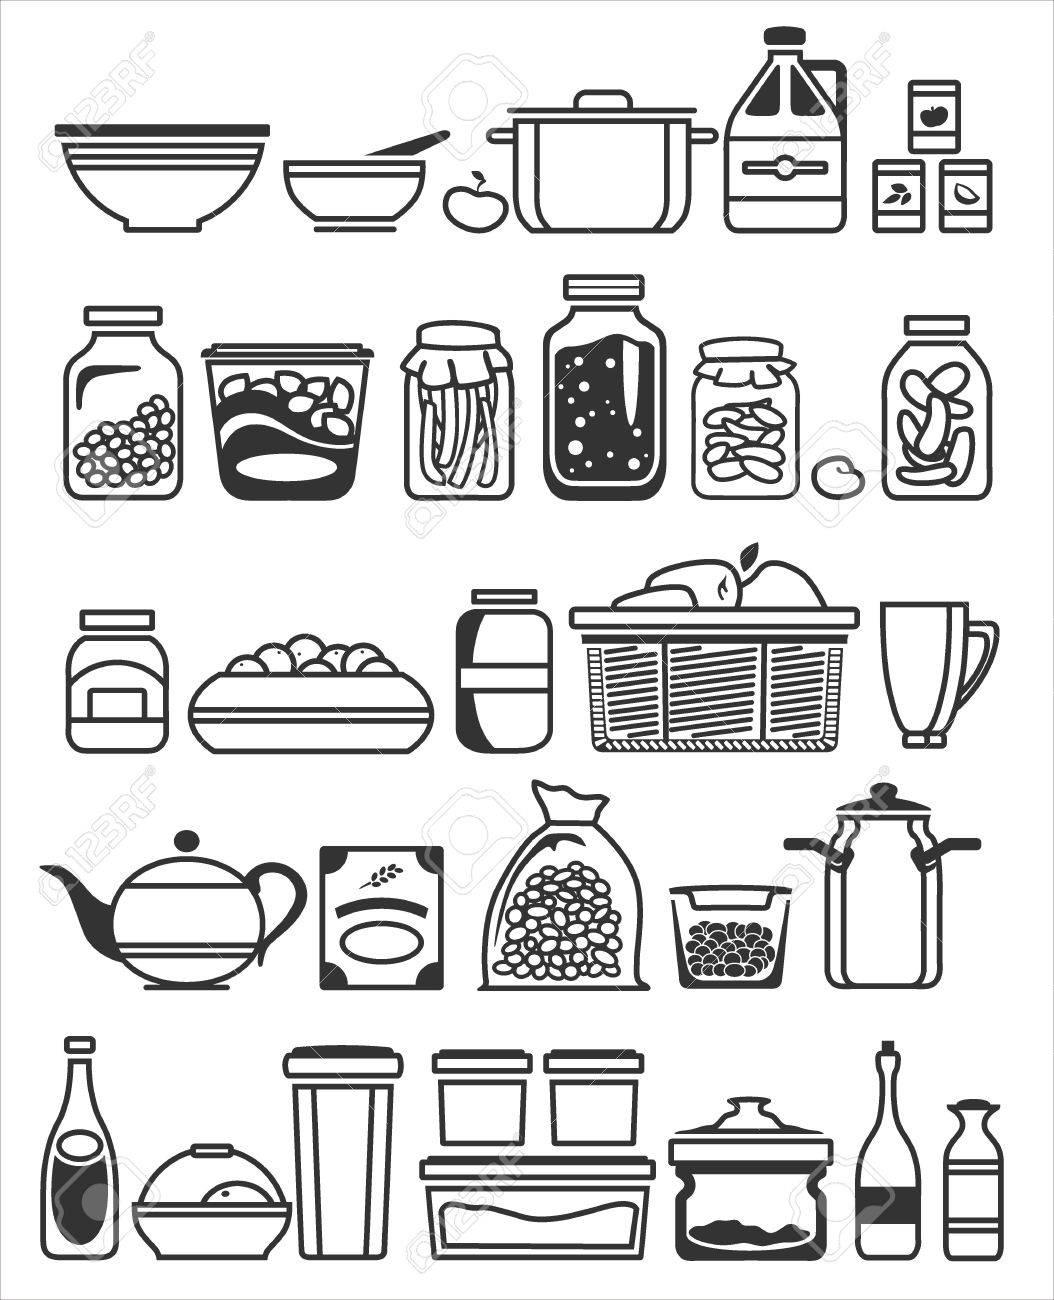 kitchen tools and utensils. Vector illustration Stock Vector - 20871689